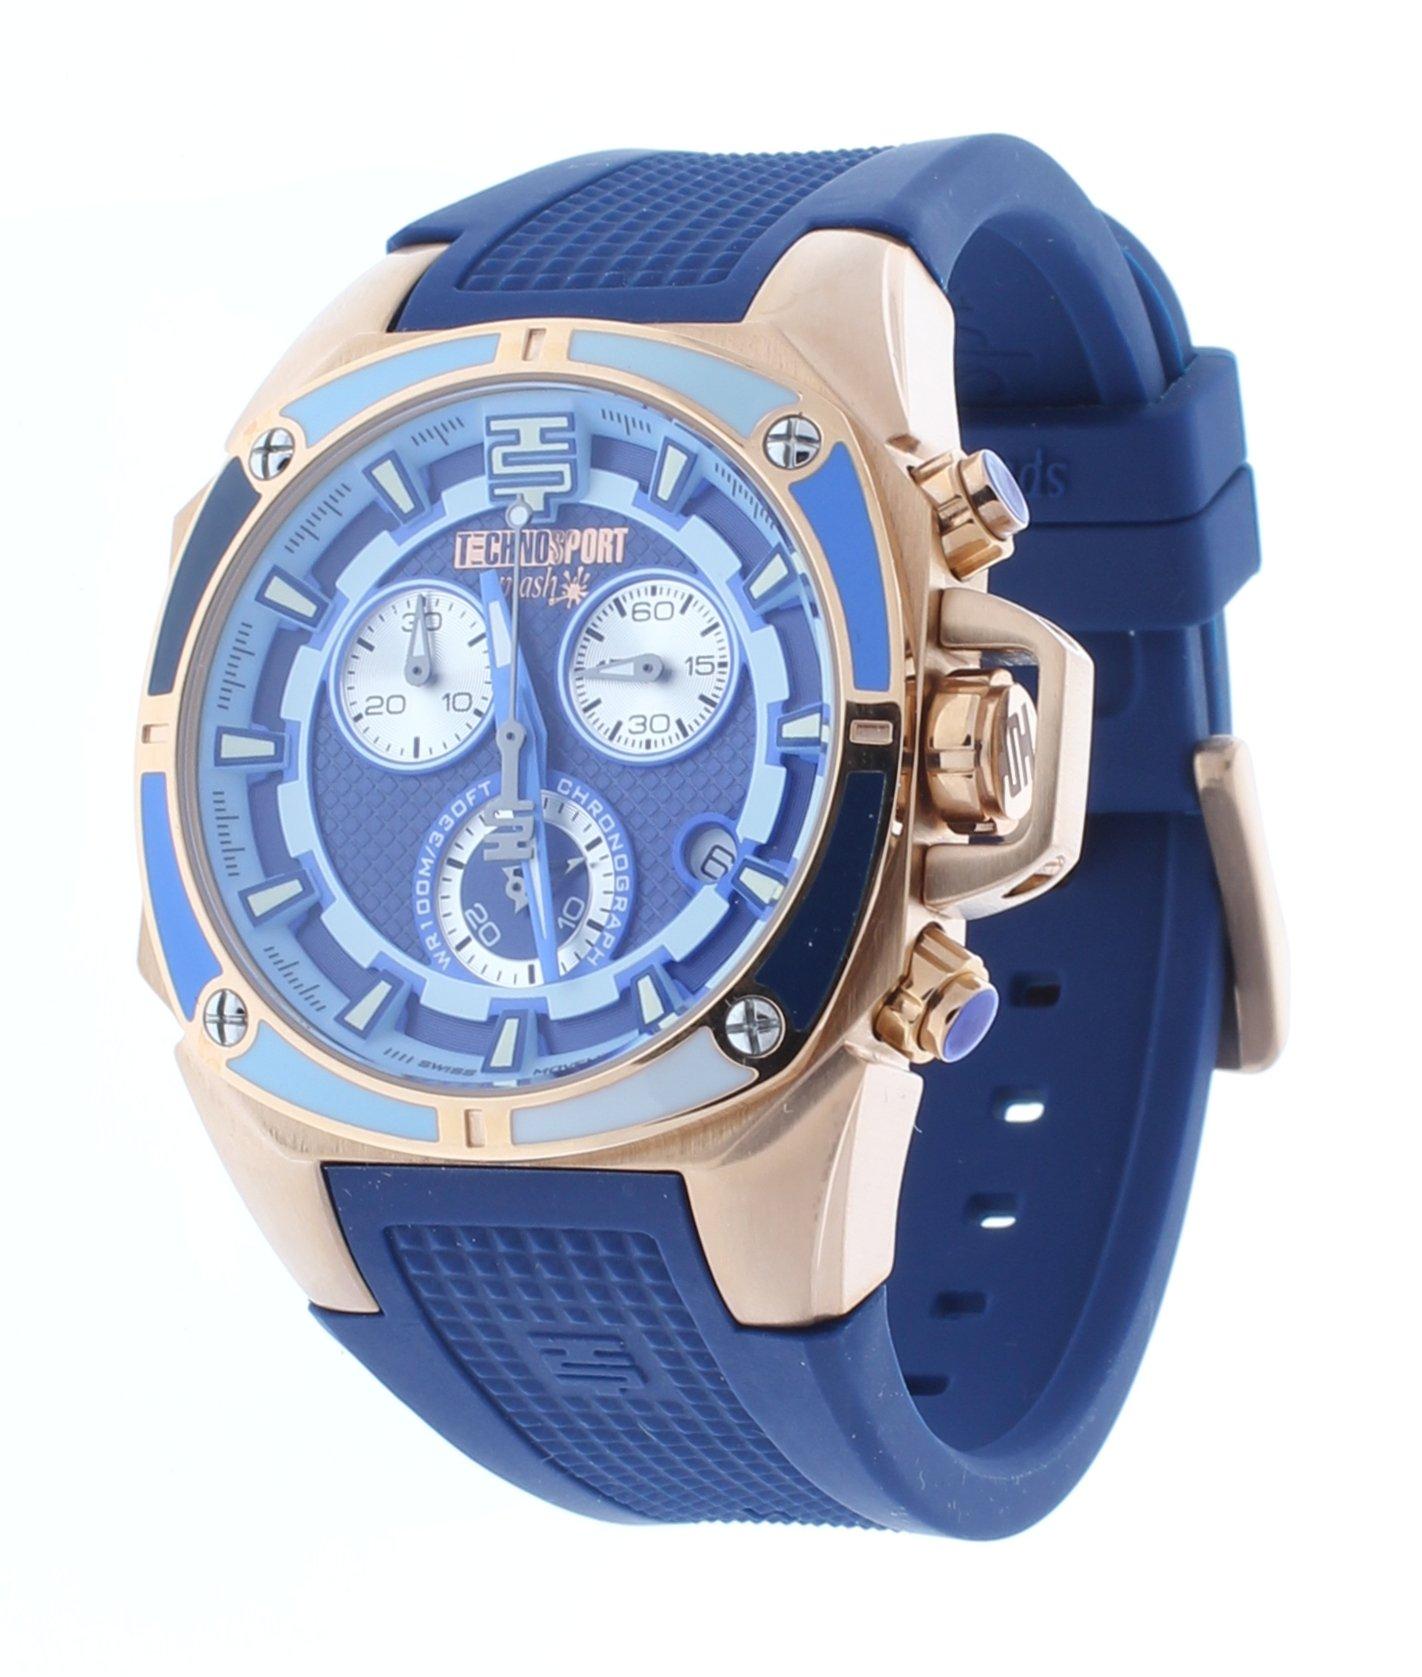 Technosport Swiss Chronograph Blue Silicone Strap 38mm Rose Gold Case Unisex Watch TS-100-Splash3